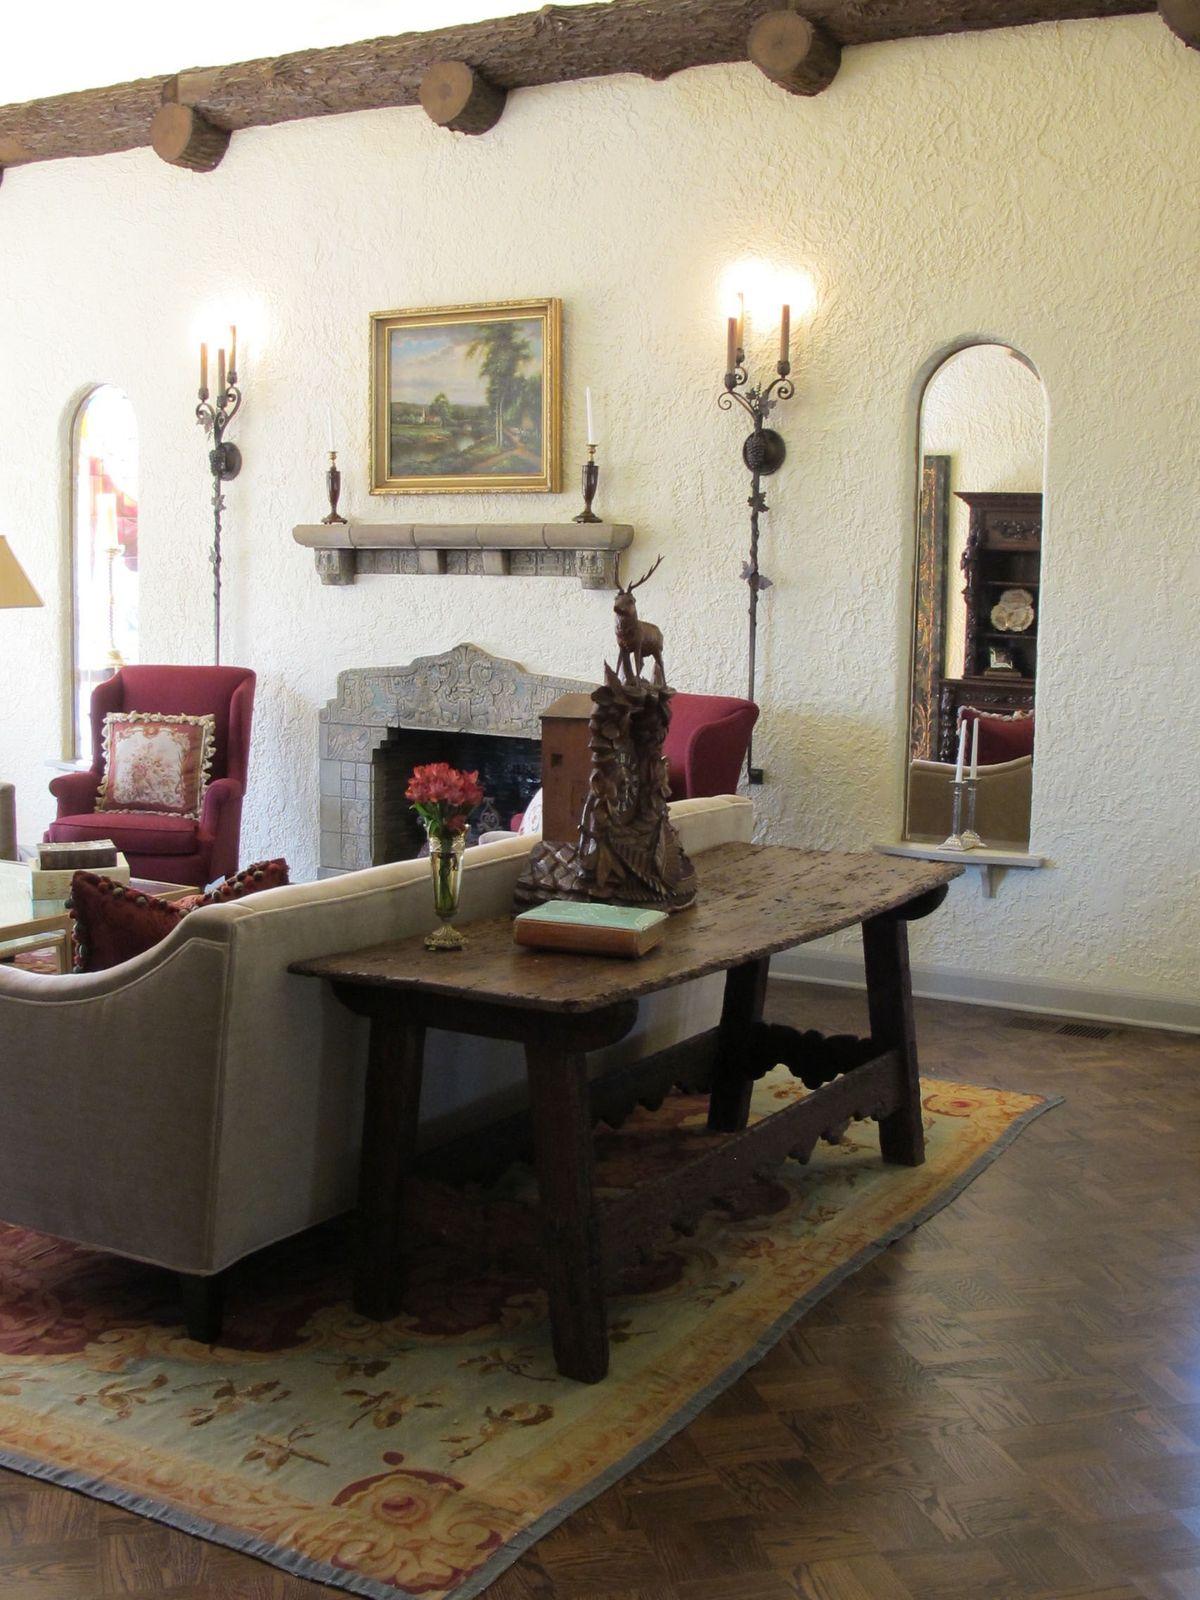 Historic Hutsell Mediterranean Home Photo Video Shoot Location 26.jpg